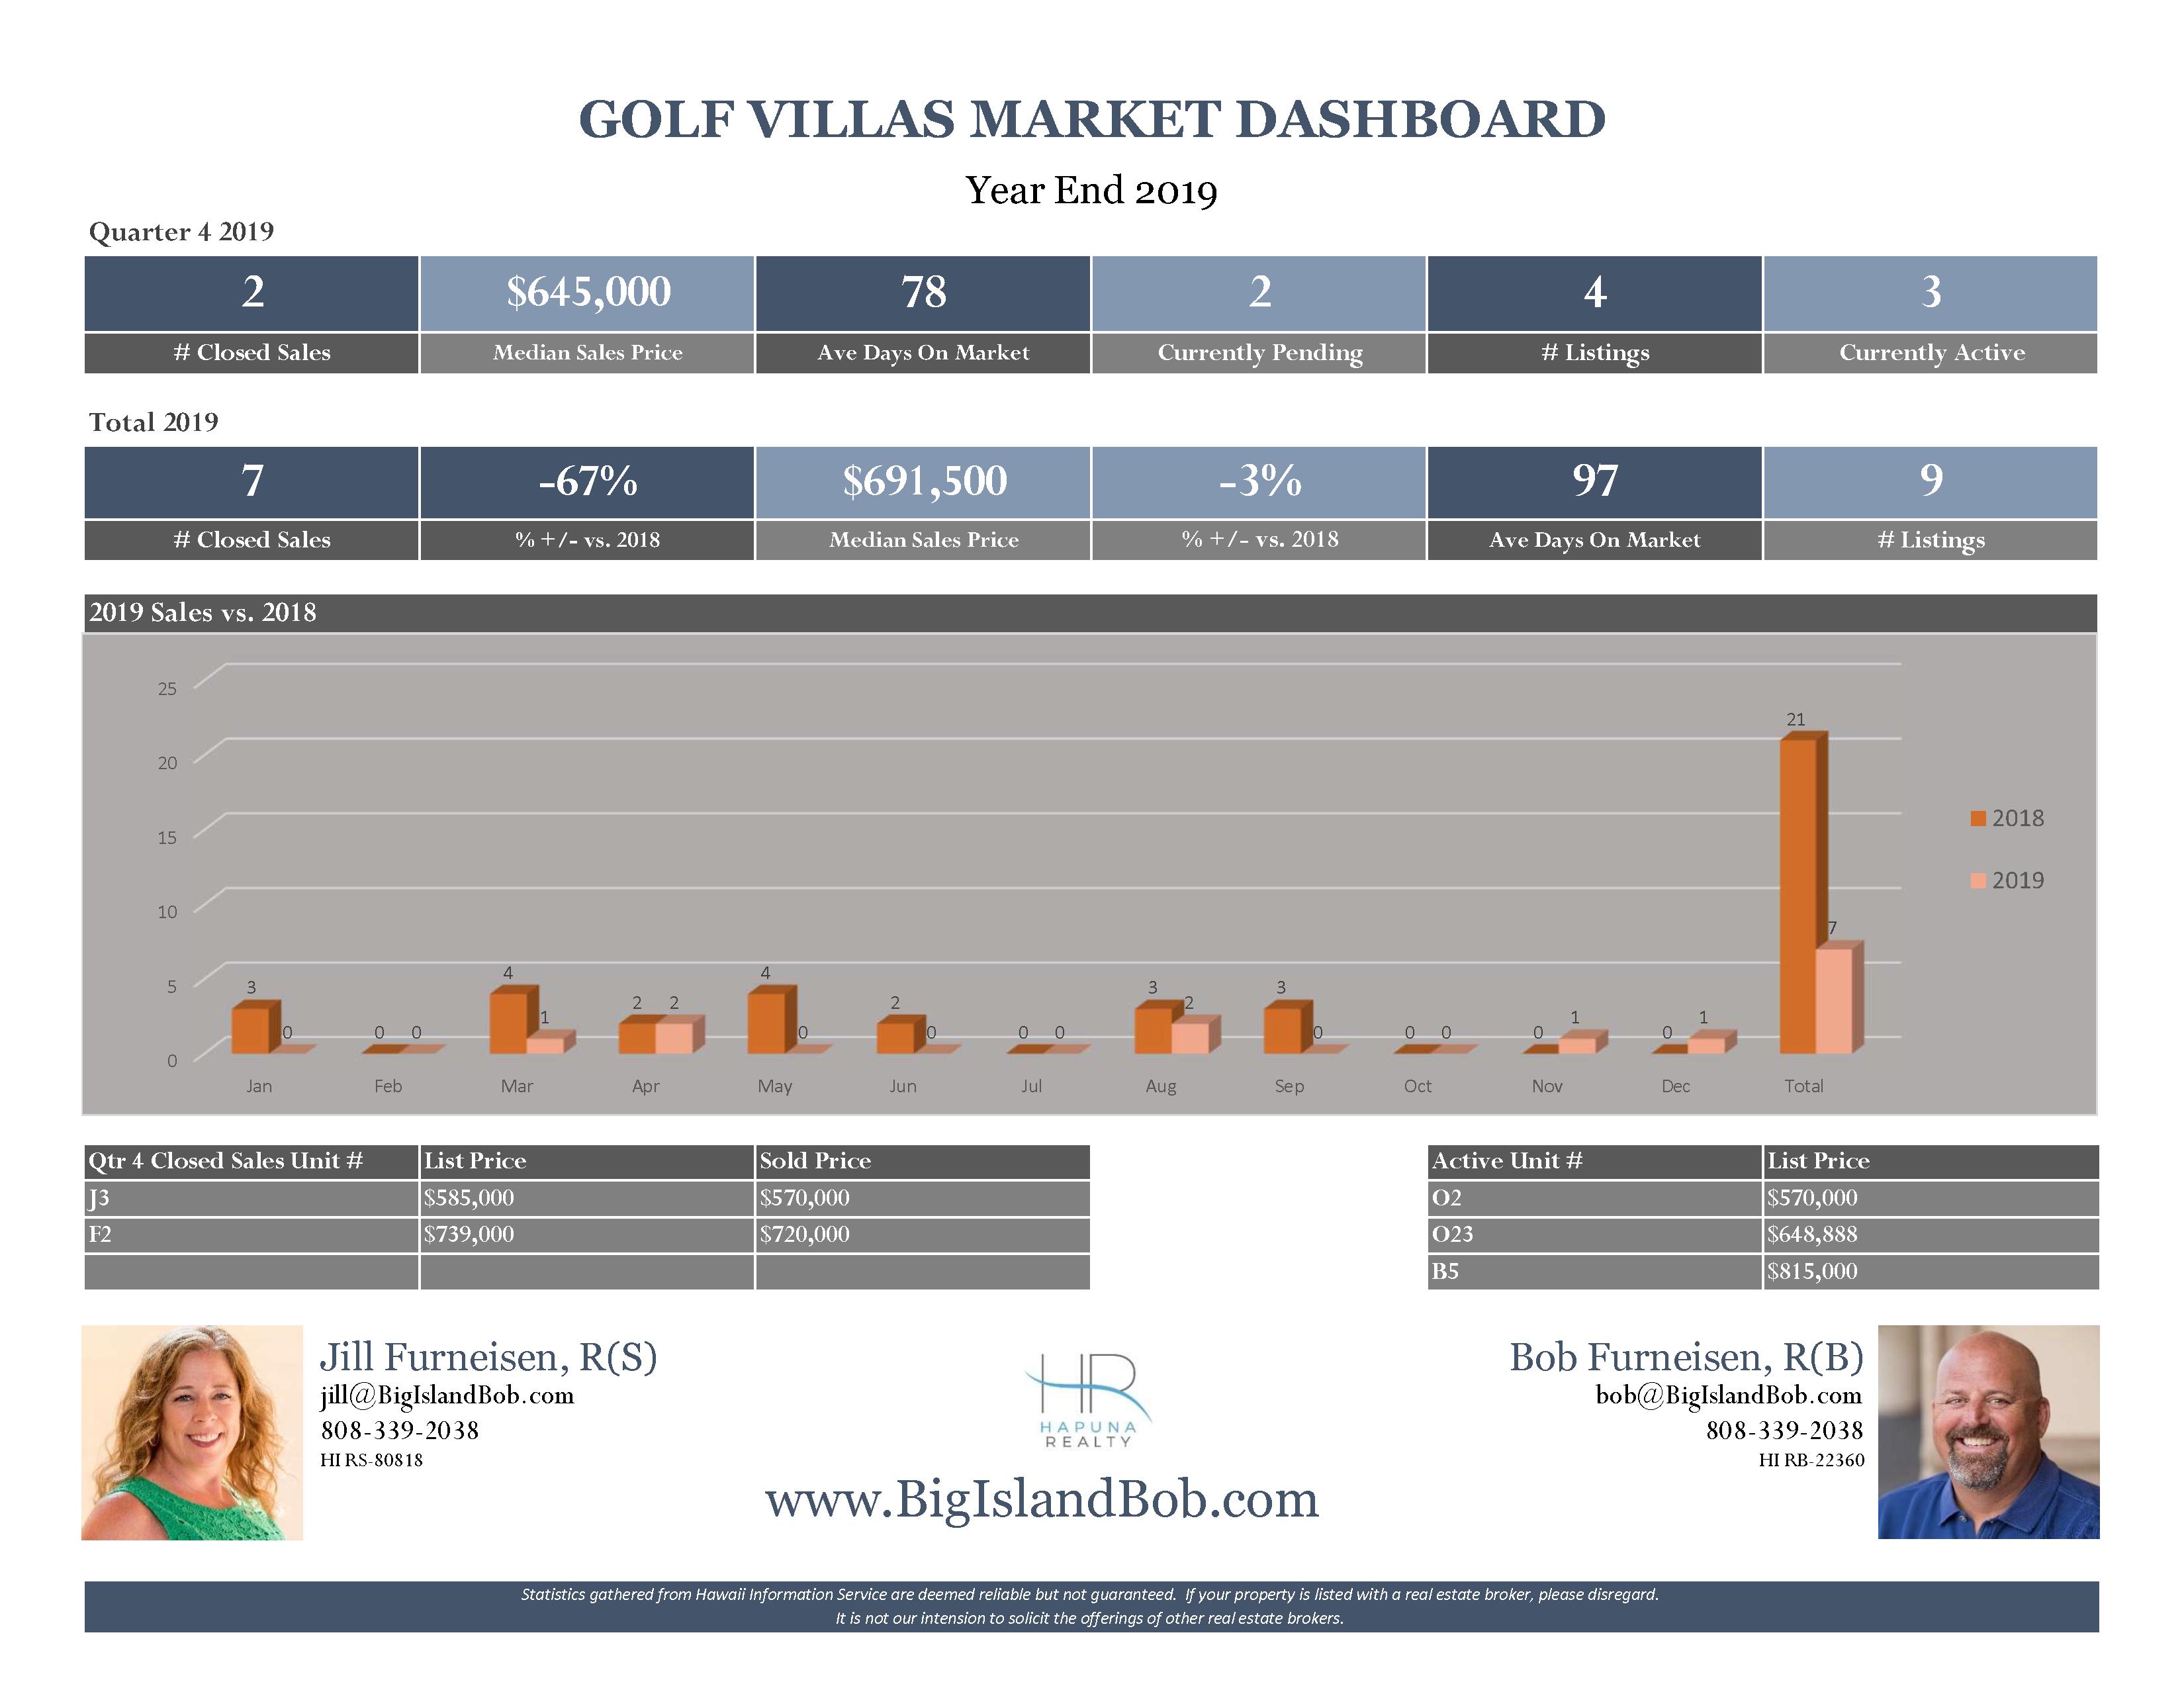 Golf Villas at Mauna Lani Year End 2019 Real Estate Market Dashboard